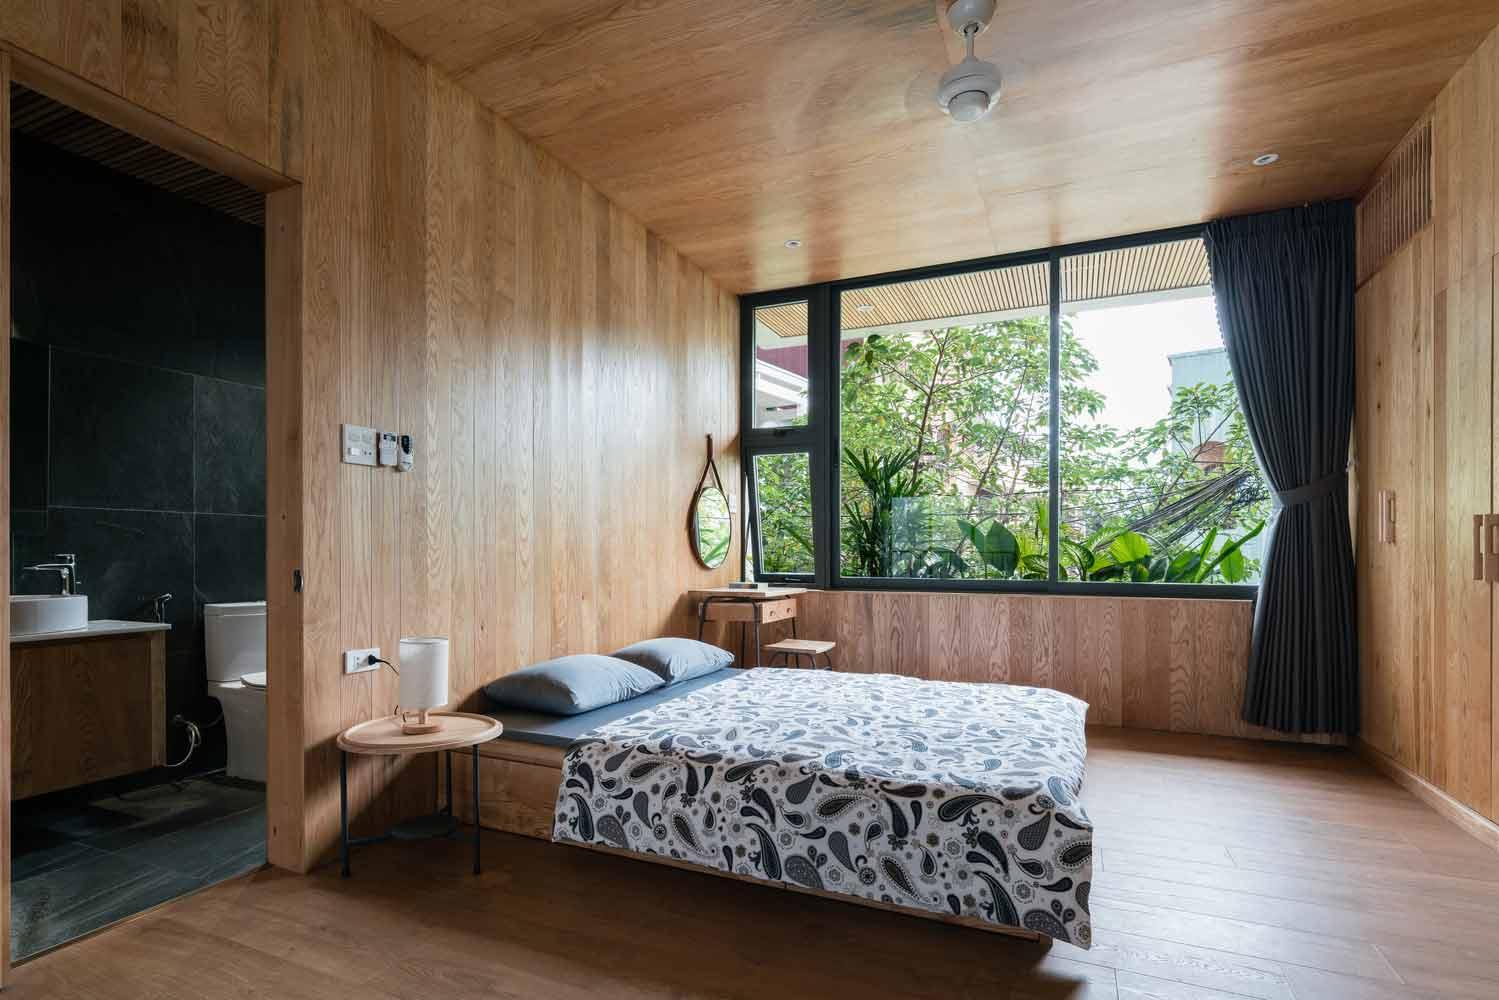 Kamar tidur bergaya tropis minimalis yang tampak sangat sejuk, karya H.a Workshop // archdaily.com